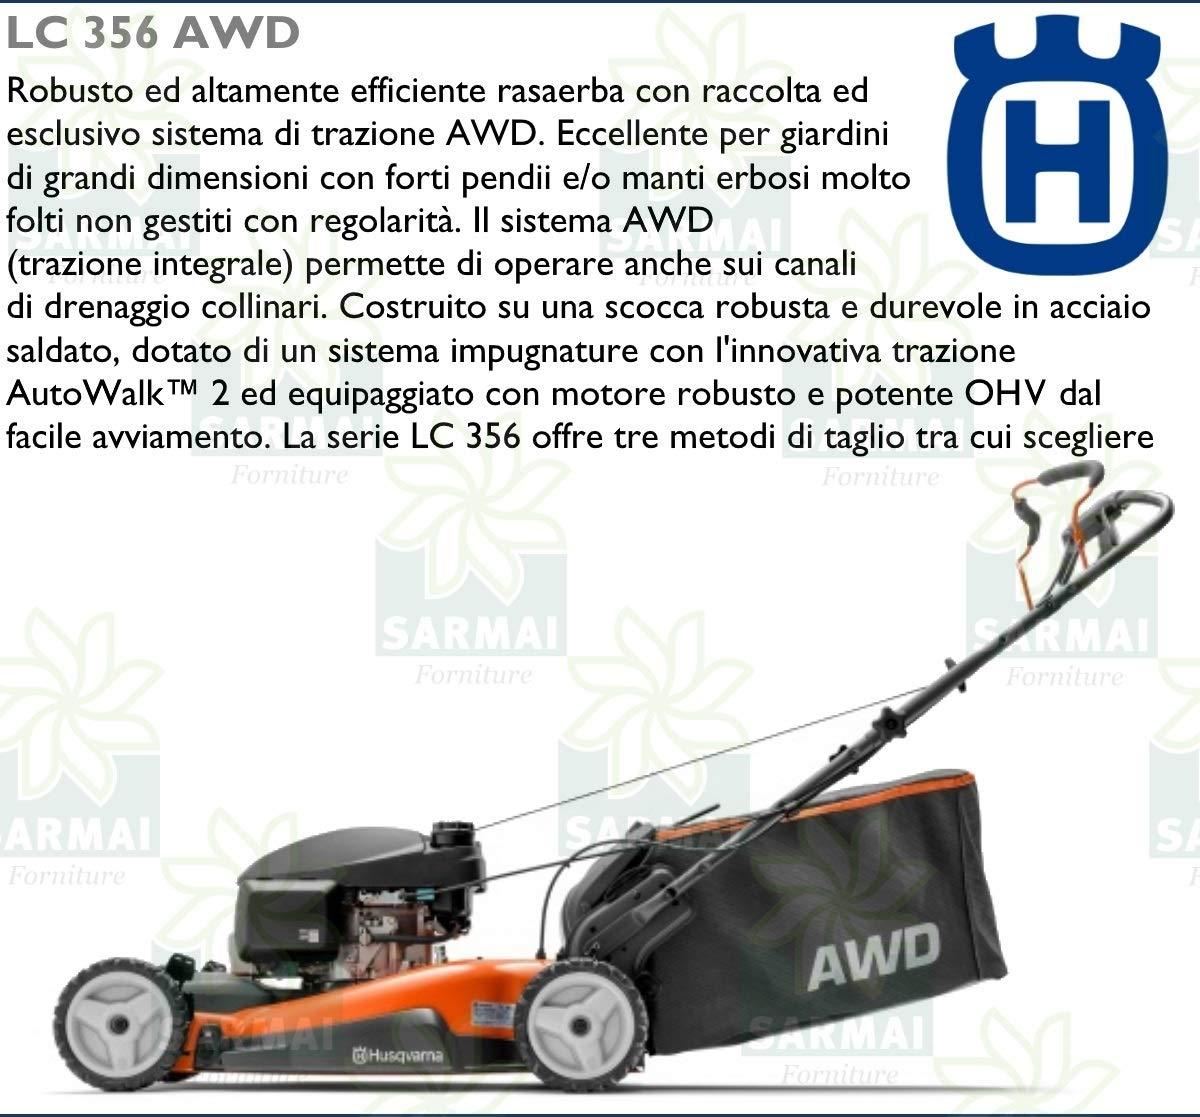 Husqvarna - Cortacésped de explosión LC 356 AWD, cortacésped de ...